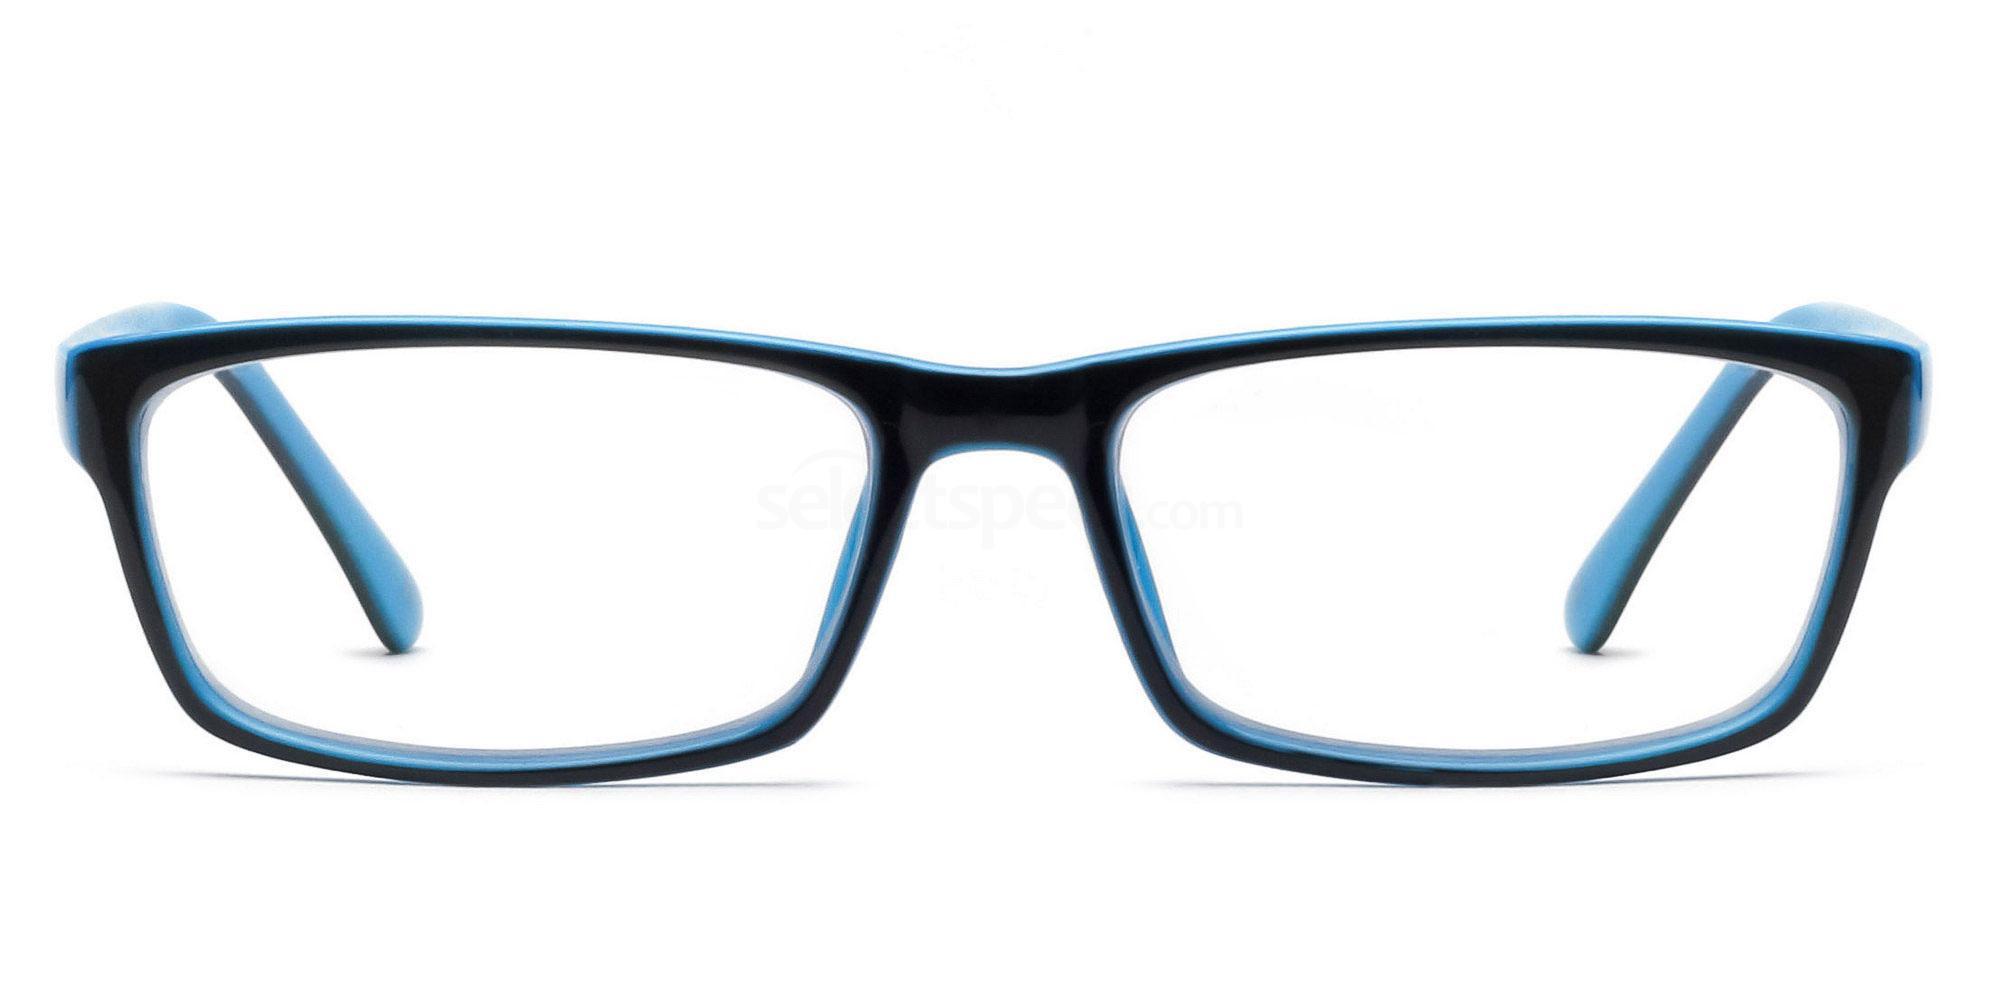 COL.25 2426 - Black and Blue Glasses, Savannah